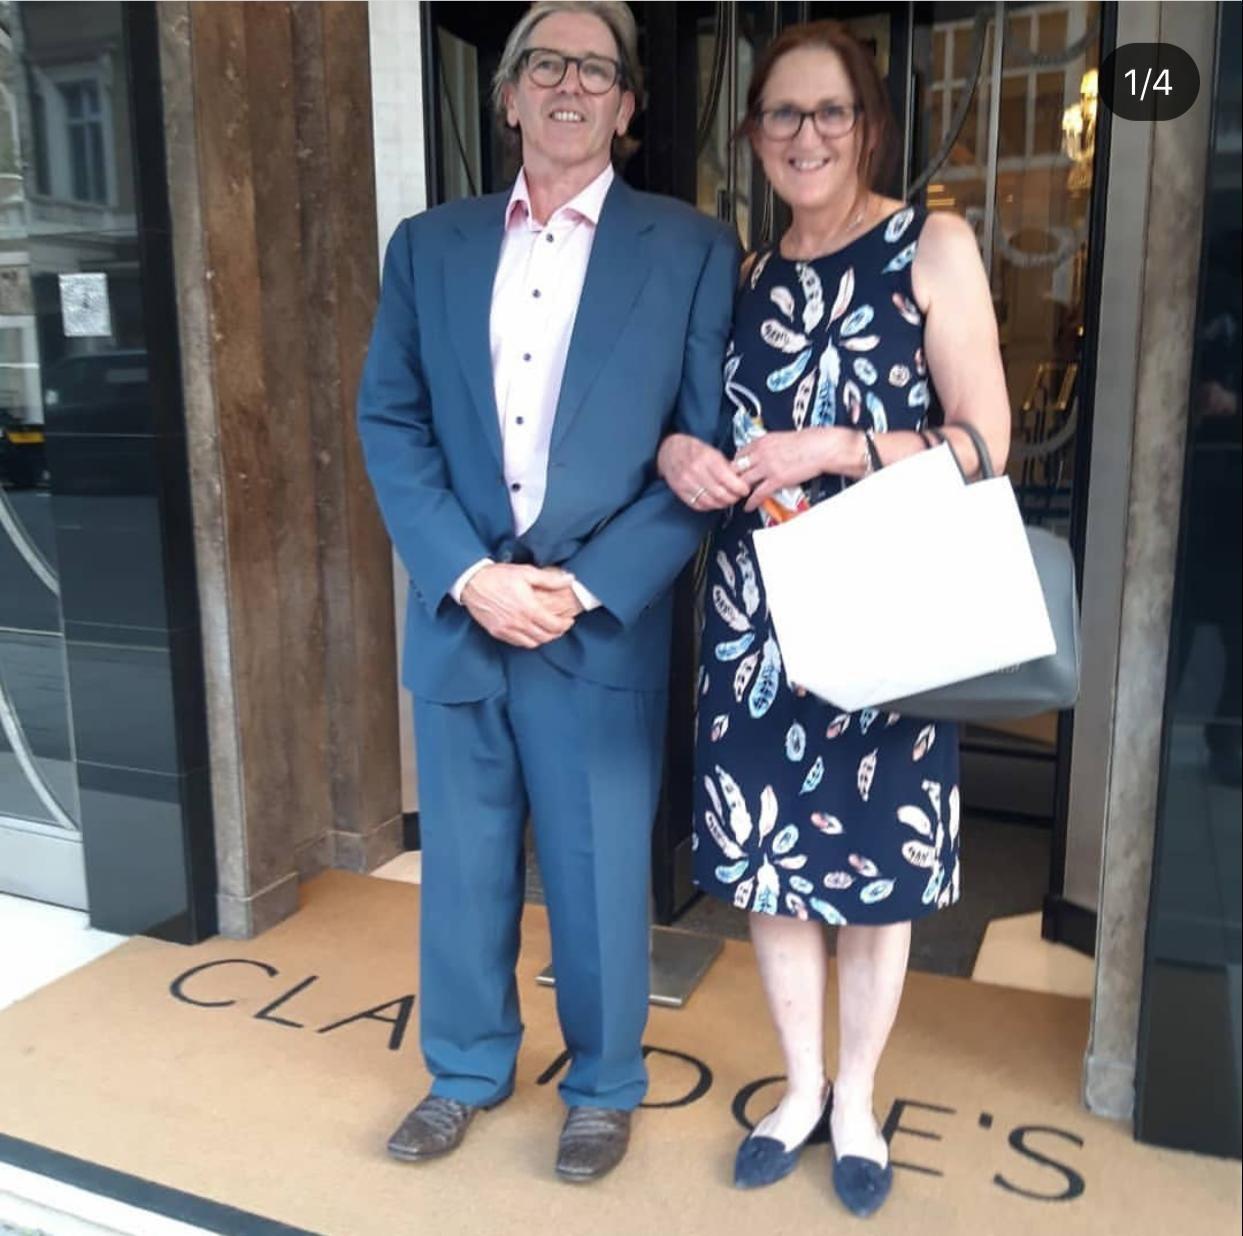 Phil and Katrina who run J&P Scaffolding